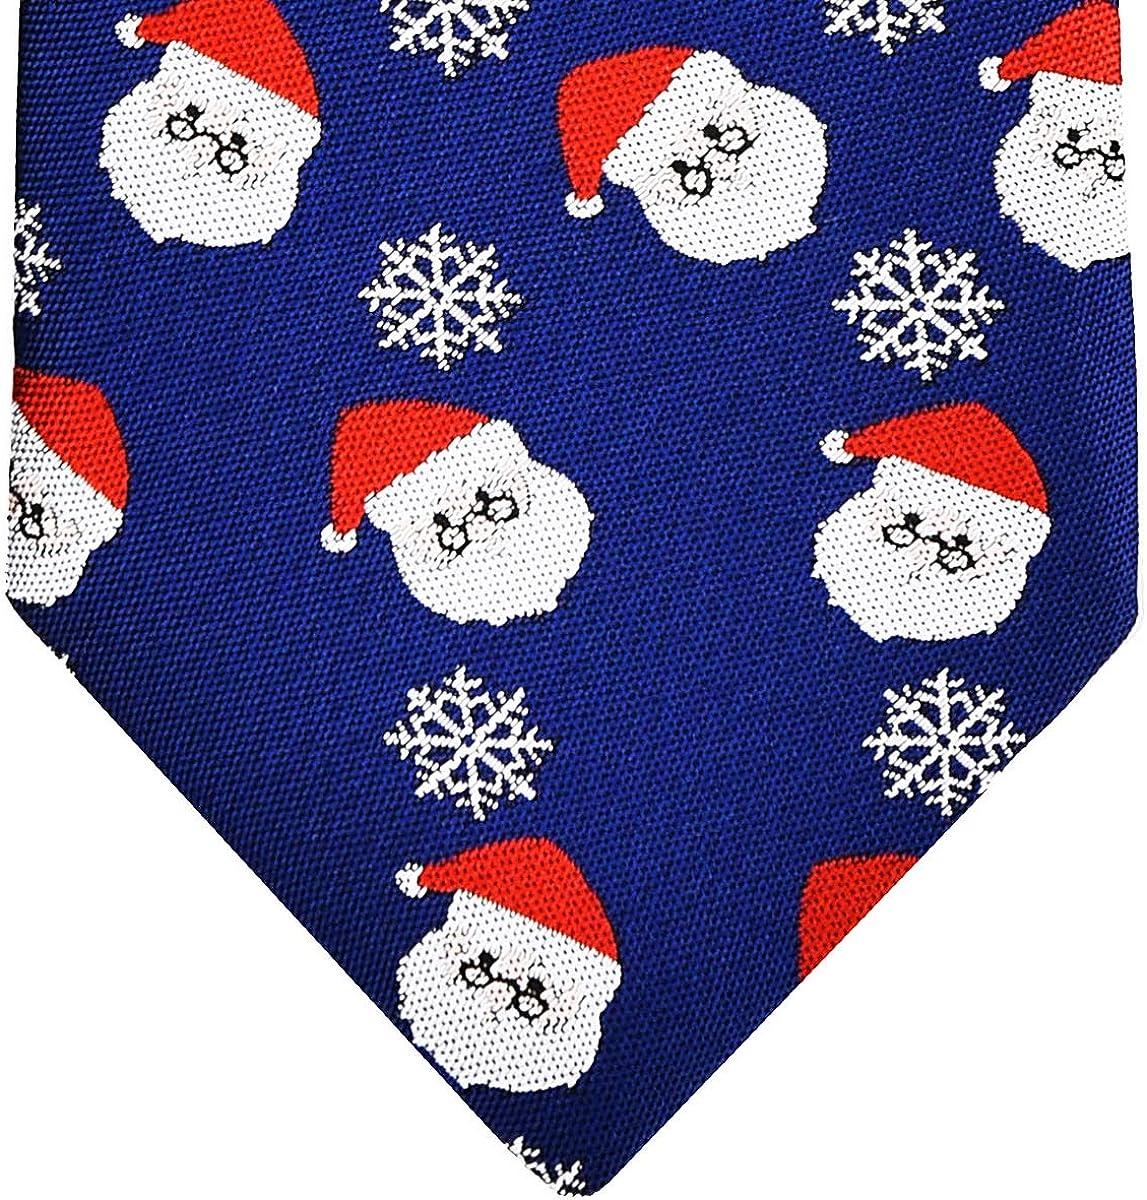 8-10 years Retreez Christmas Santa Claus with Snowflakes Pattern Boys Tie